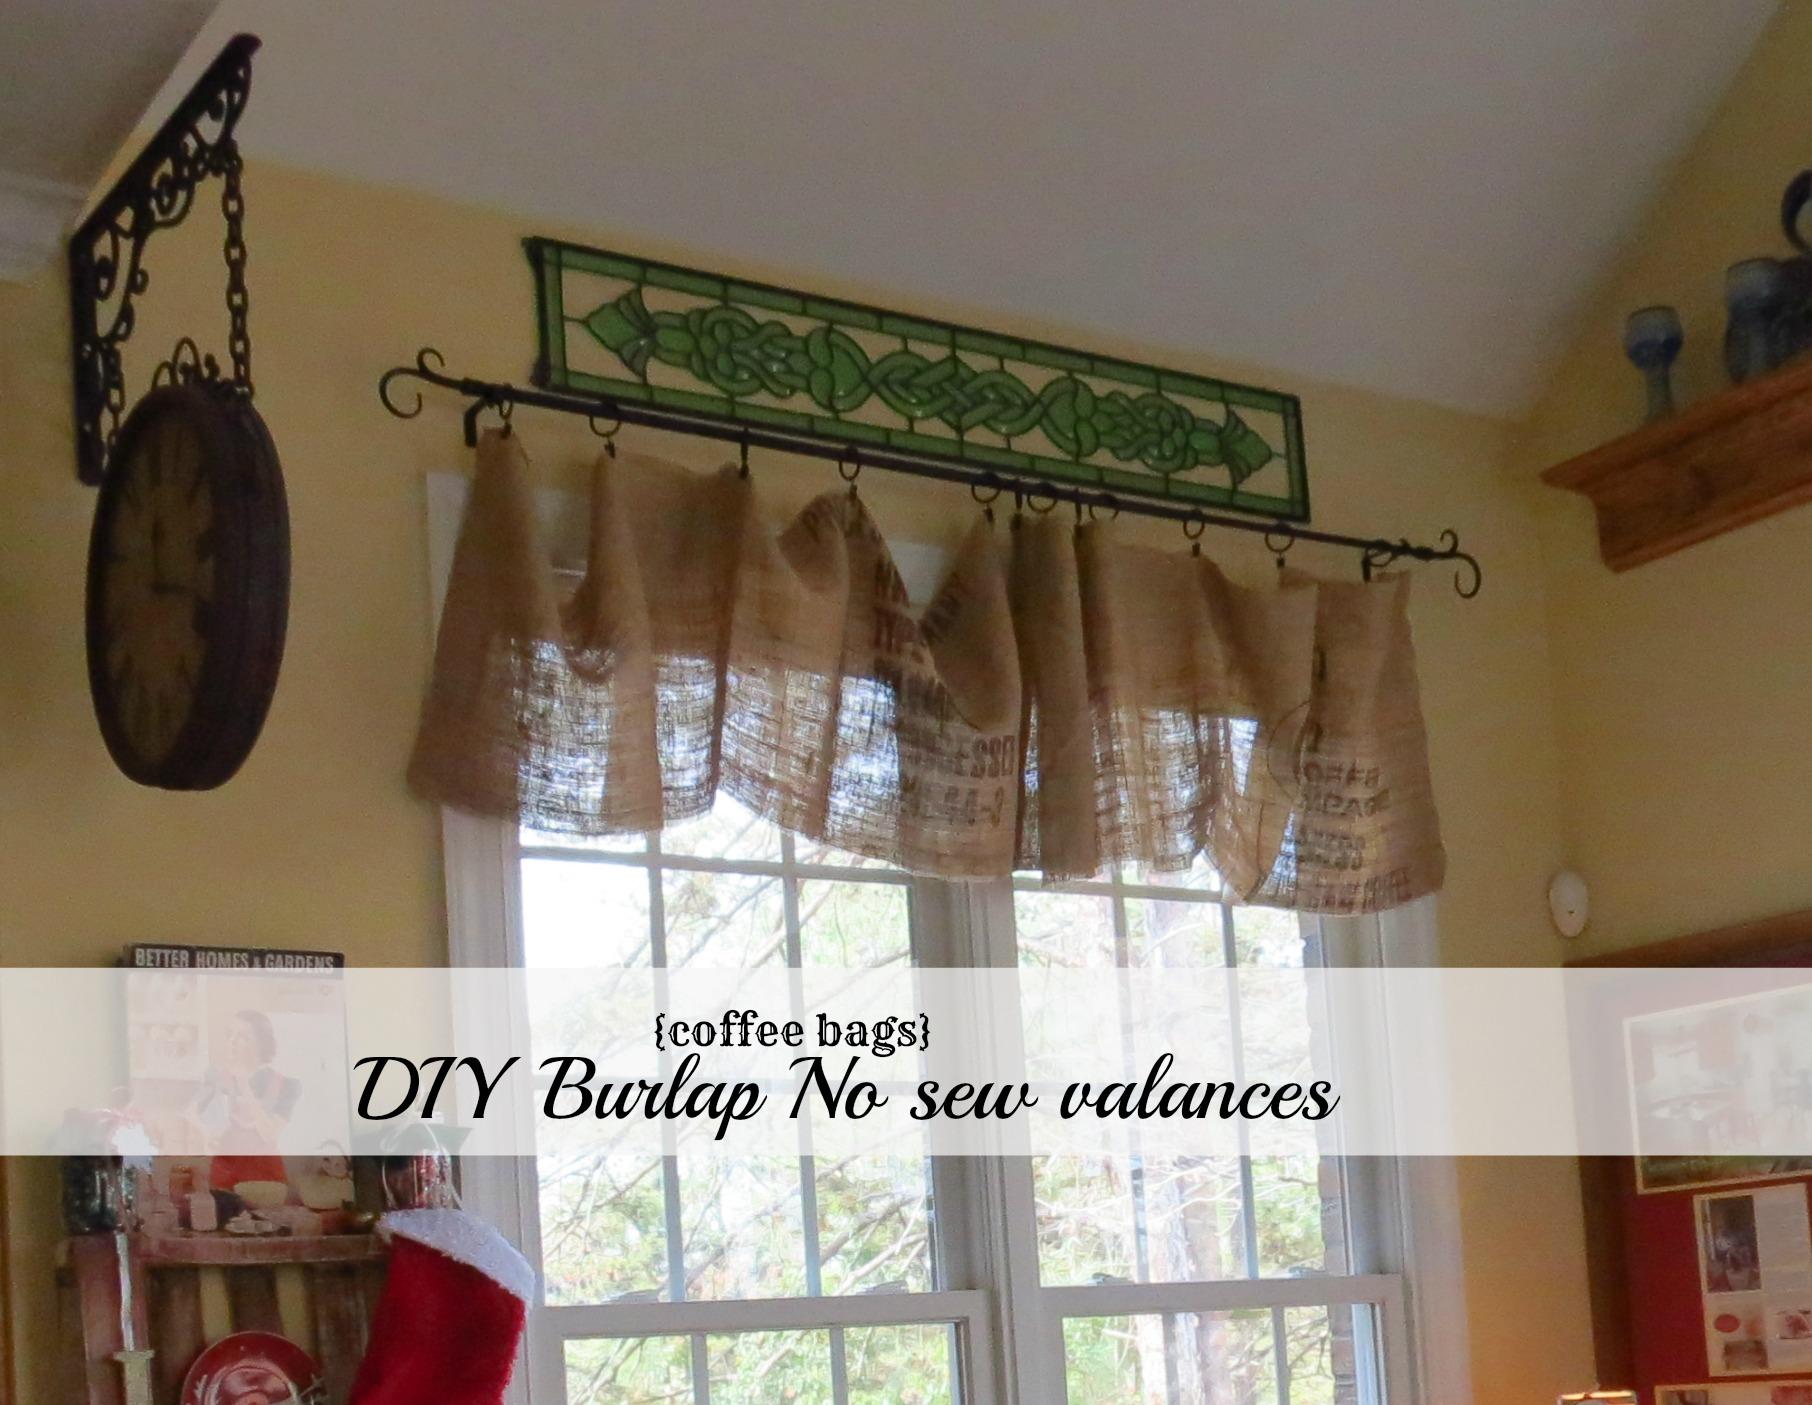 Diy No Sew Burlap Kitchen Valances De From Coffee Bags